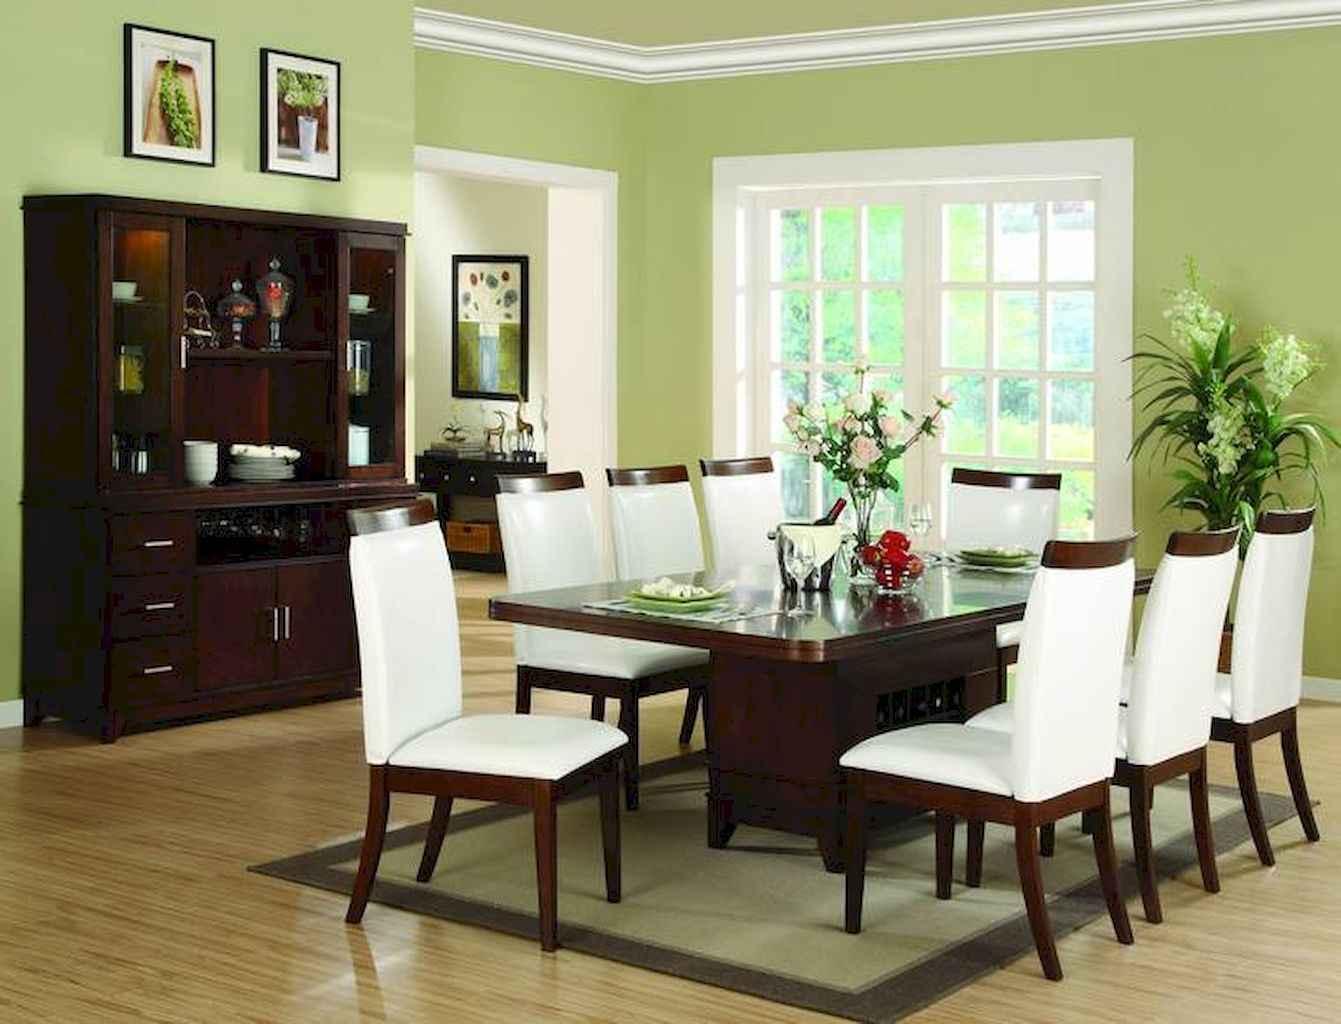 80 Stunning Apartment Dining Room Decor Ideas (18)